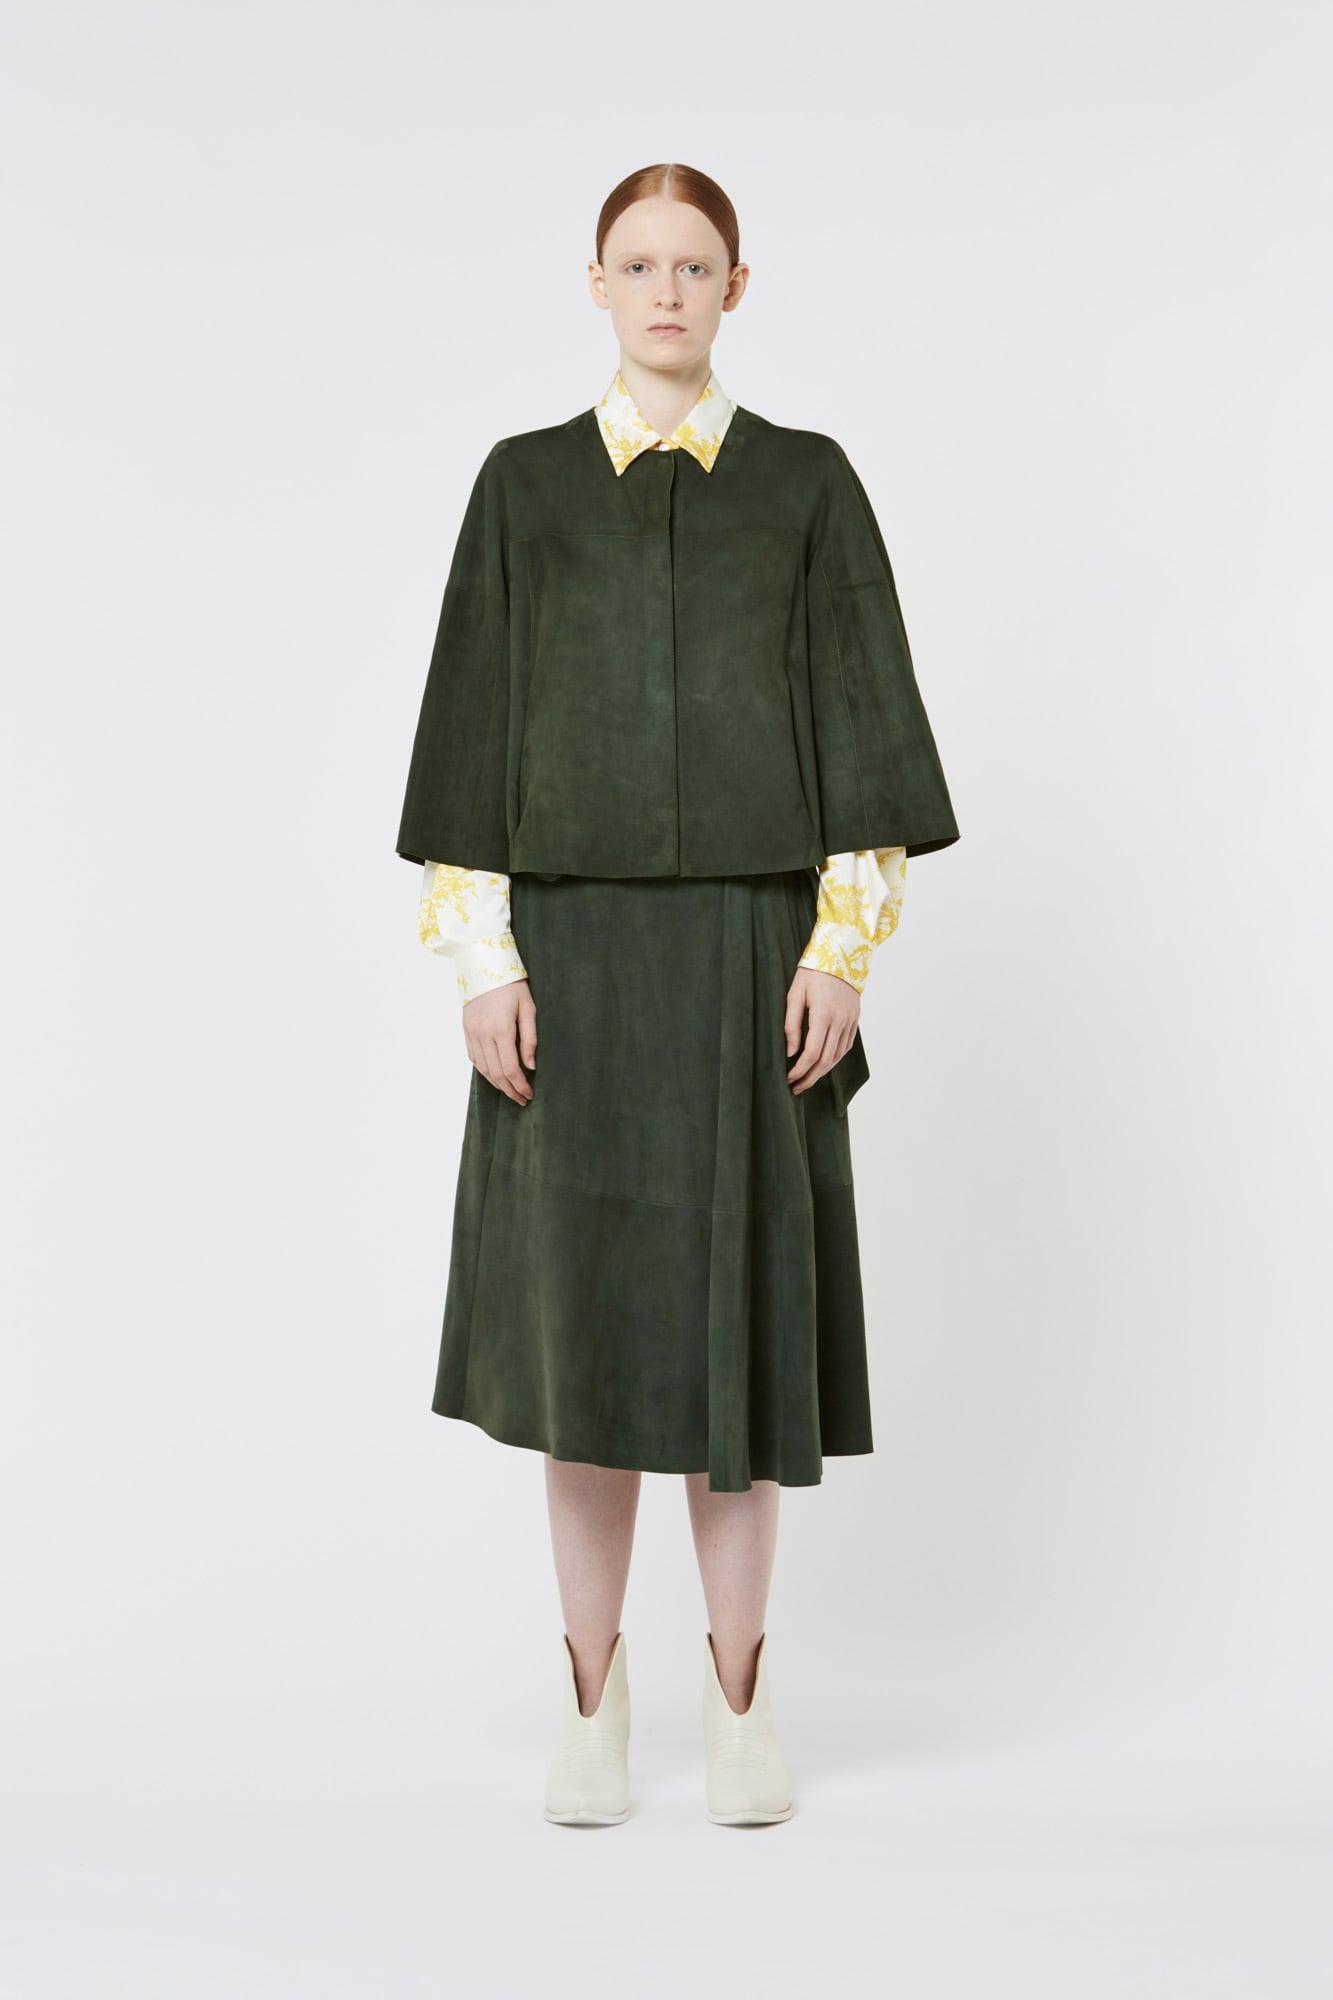 Green Suede Jacket